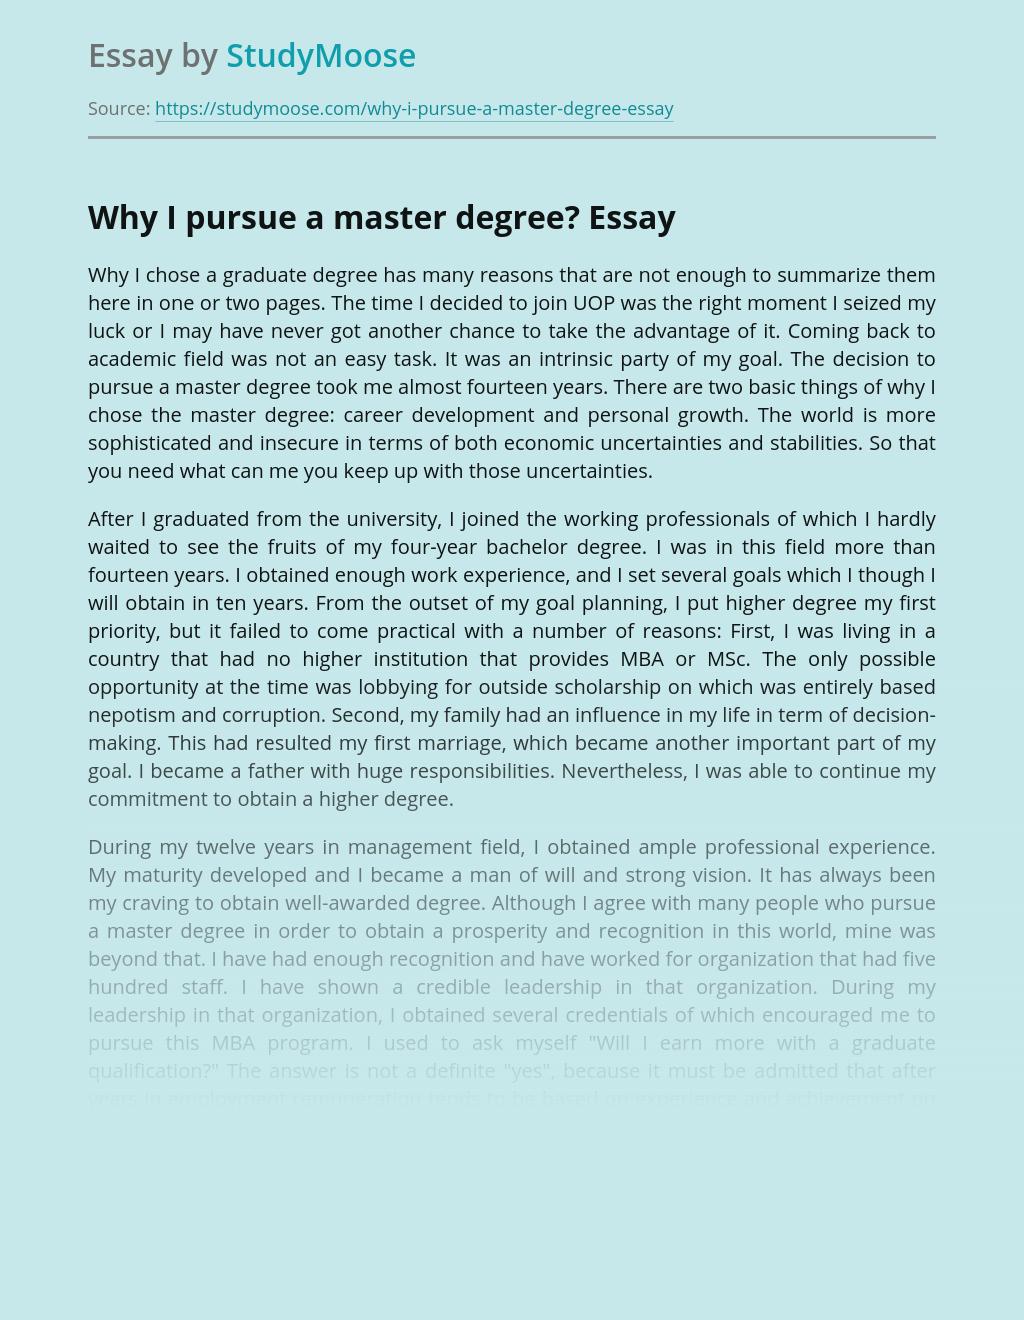 Why I pursue a master degree?